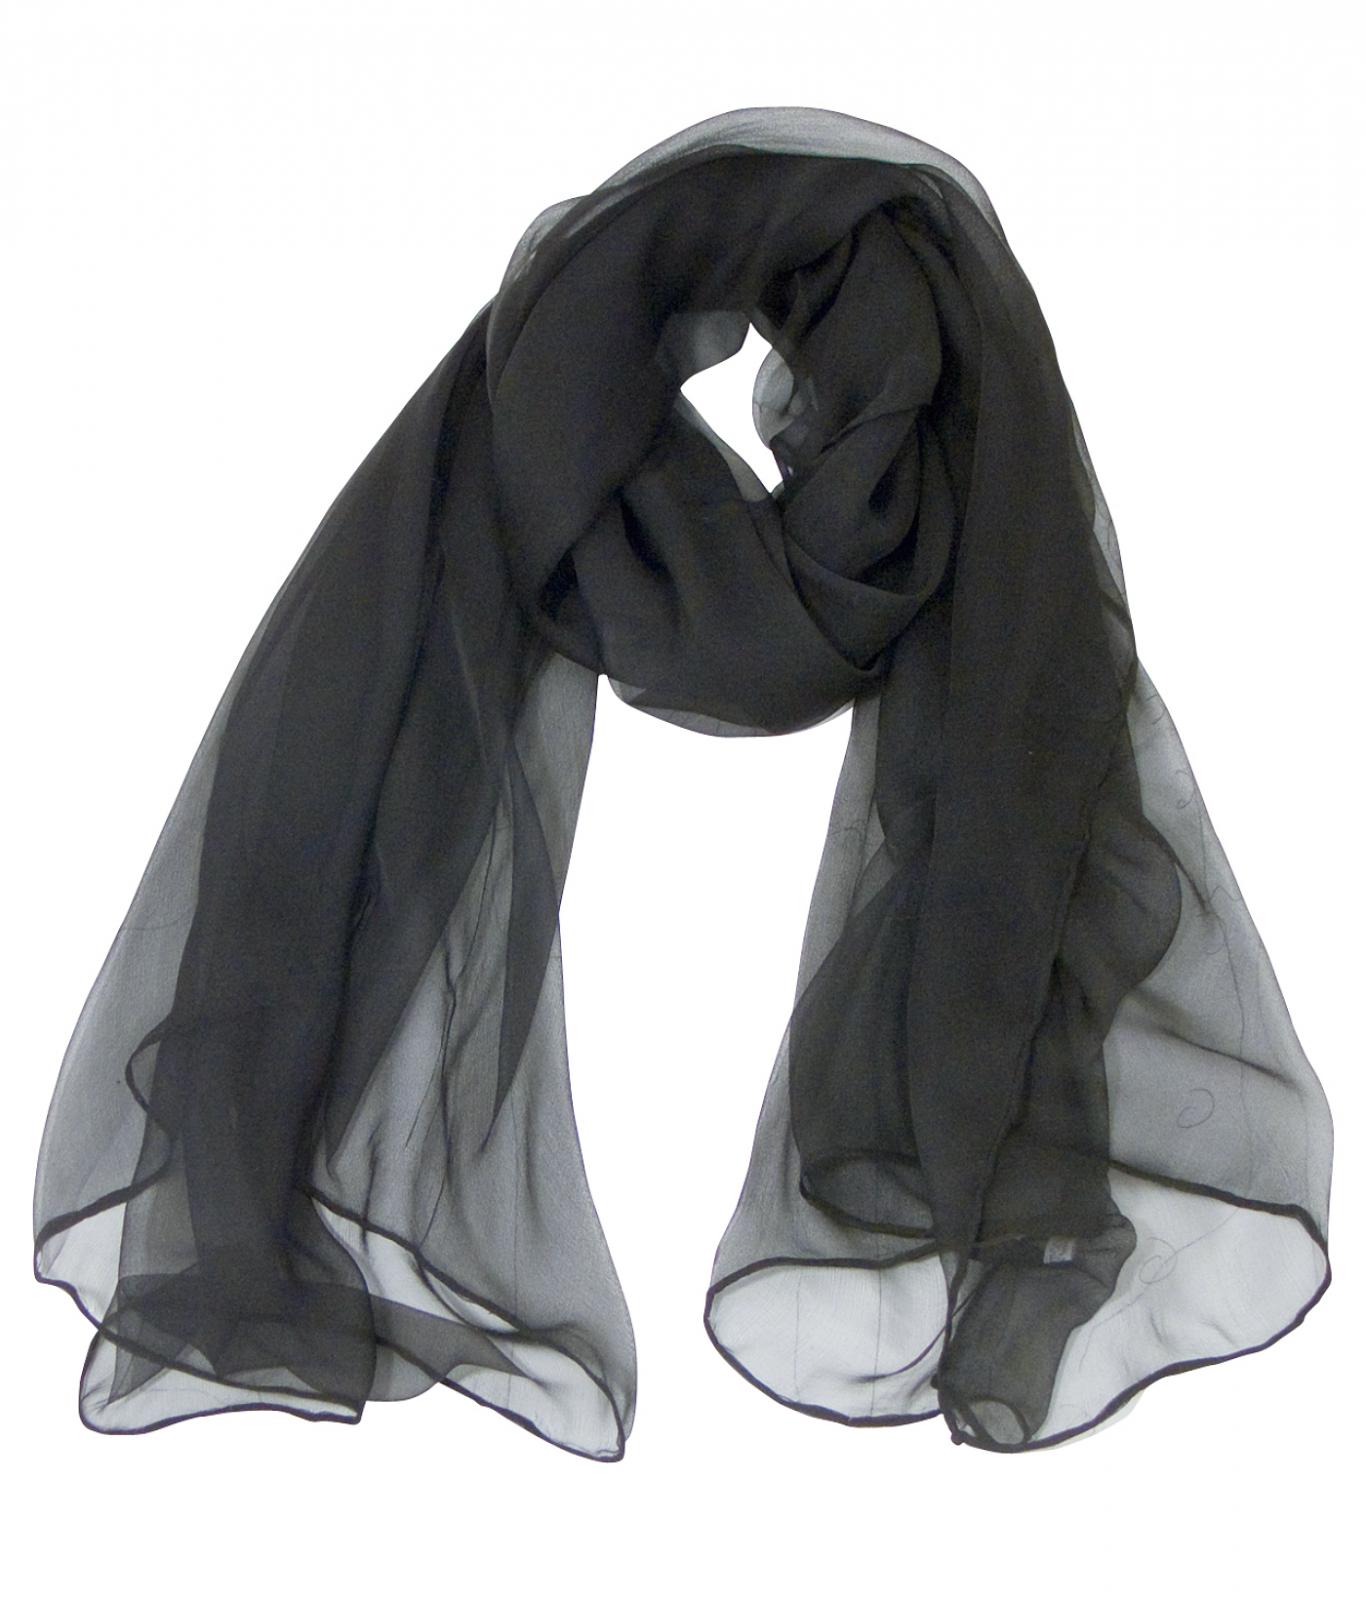 Foulard ou écharpe echarpe noire et blanche femme   Zolushca a84cfbad027